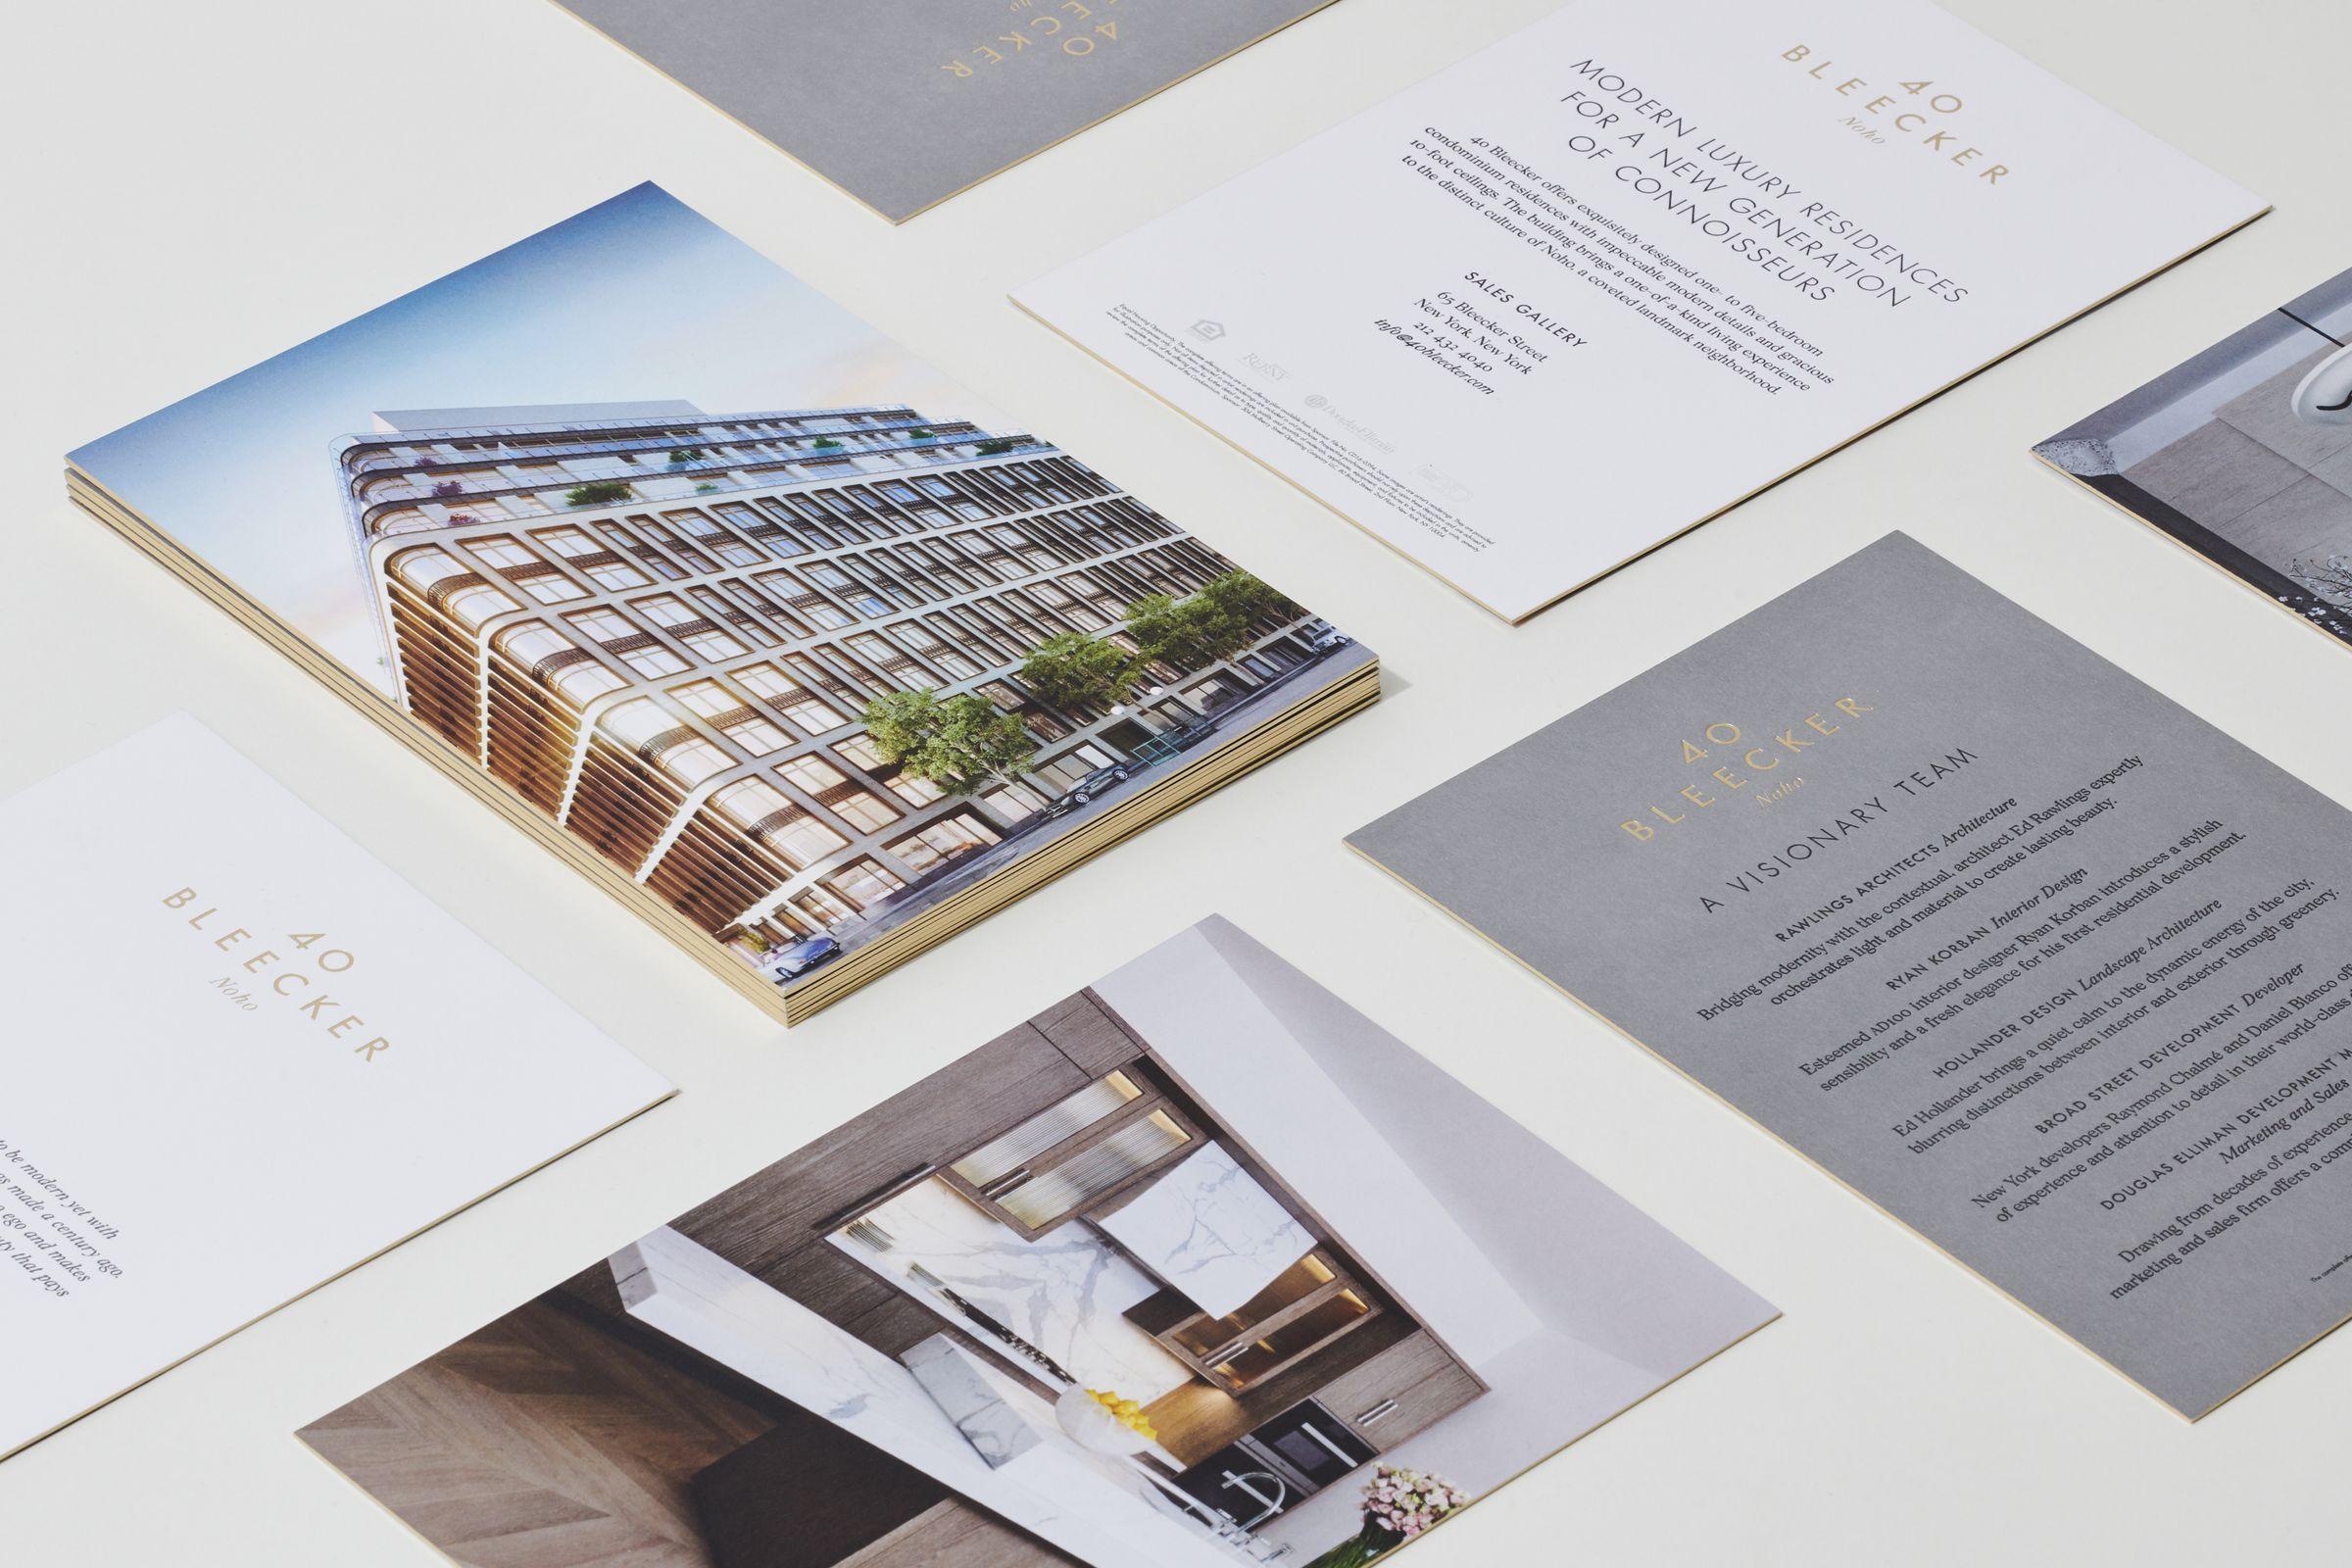 40 Bleecker marketing materials close up of gilded cards